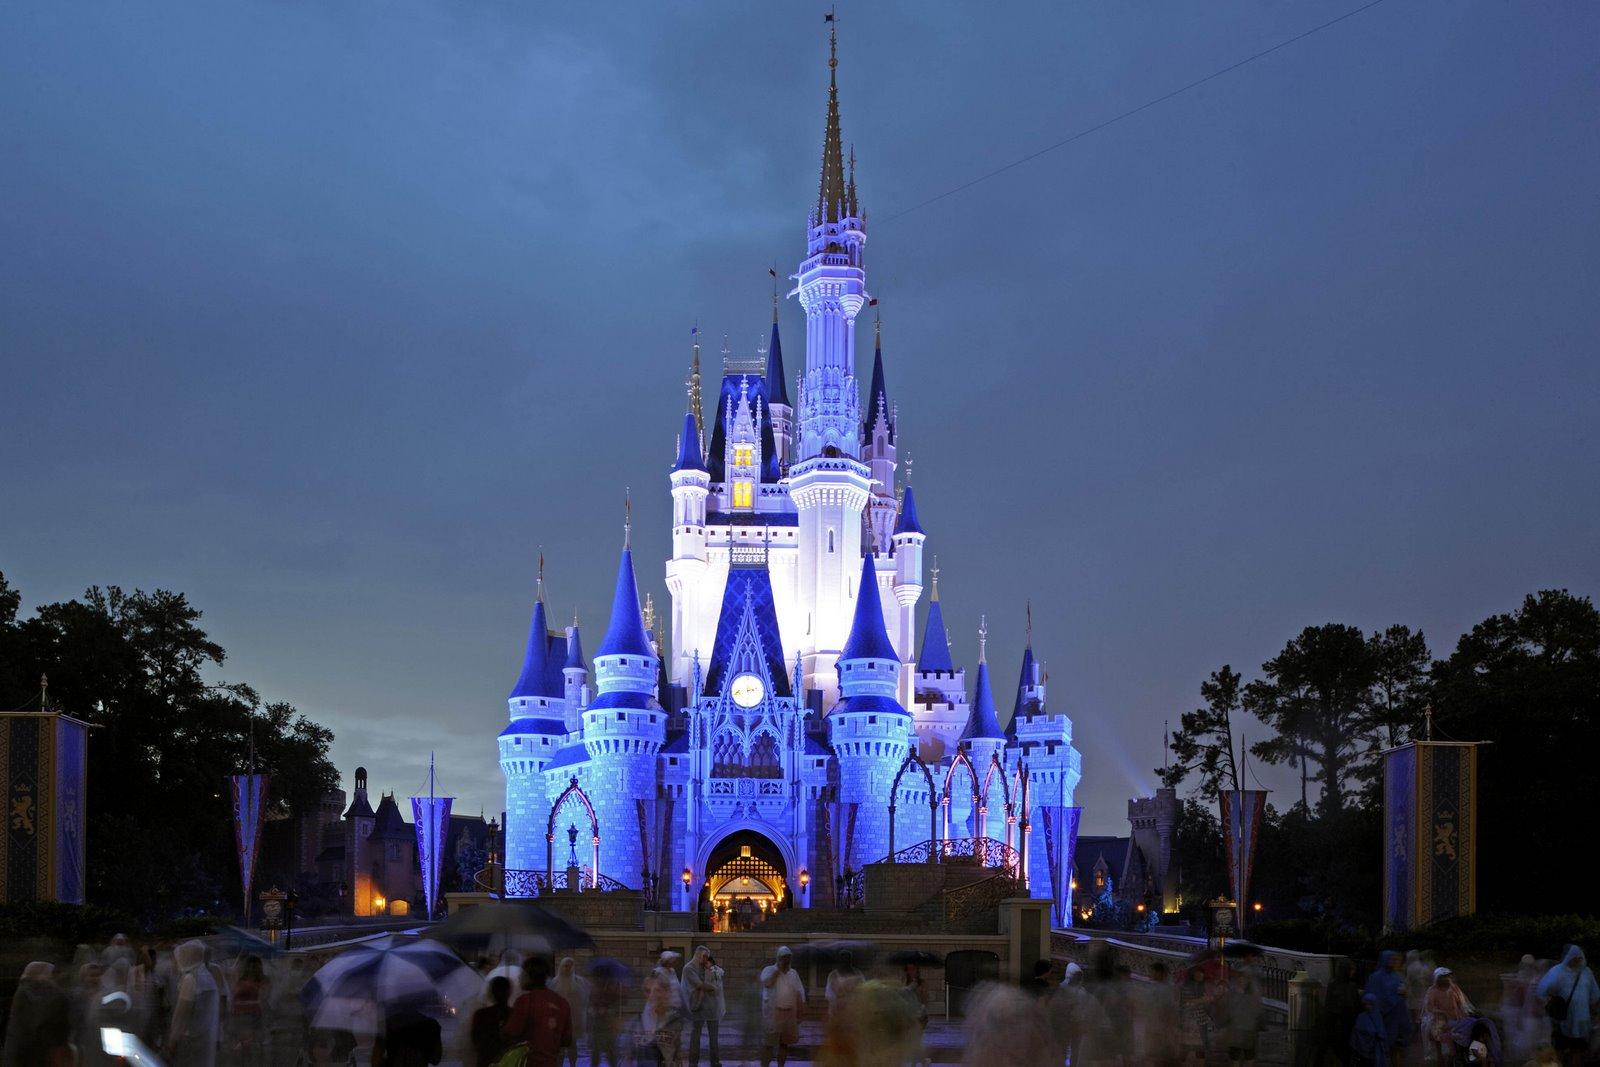 http://4.bp.blogspot.com/-cFmOQsZk5G0/TcOMpy4vmpI/AAAAAAAALEQ/Sik2JcTZGSU/s1600/Magic-Blue-Castle-740422.jpg